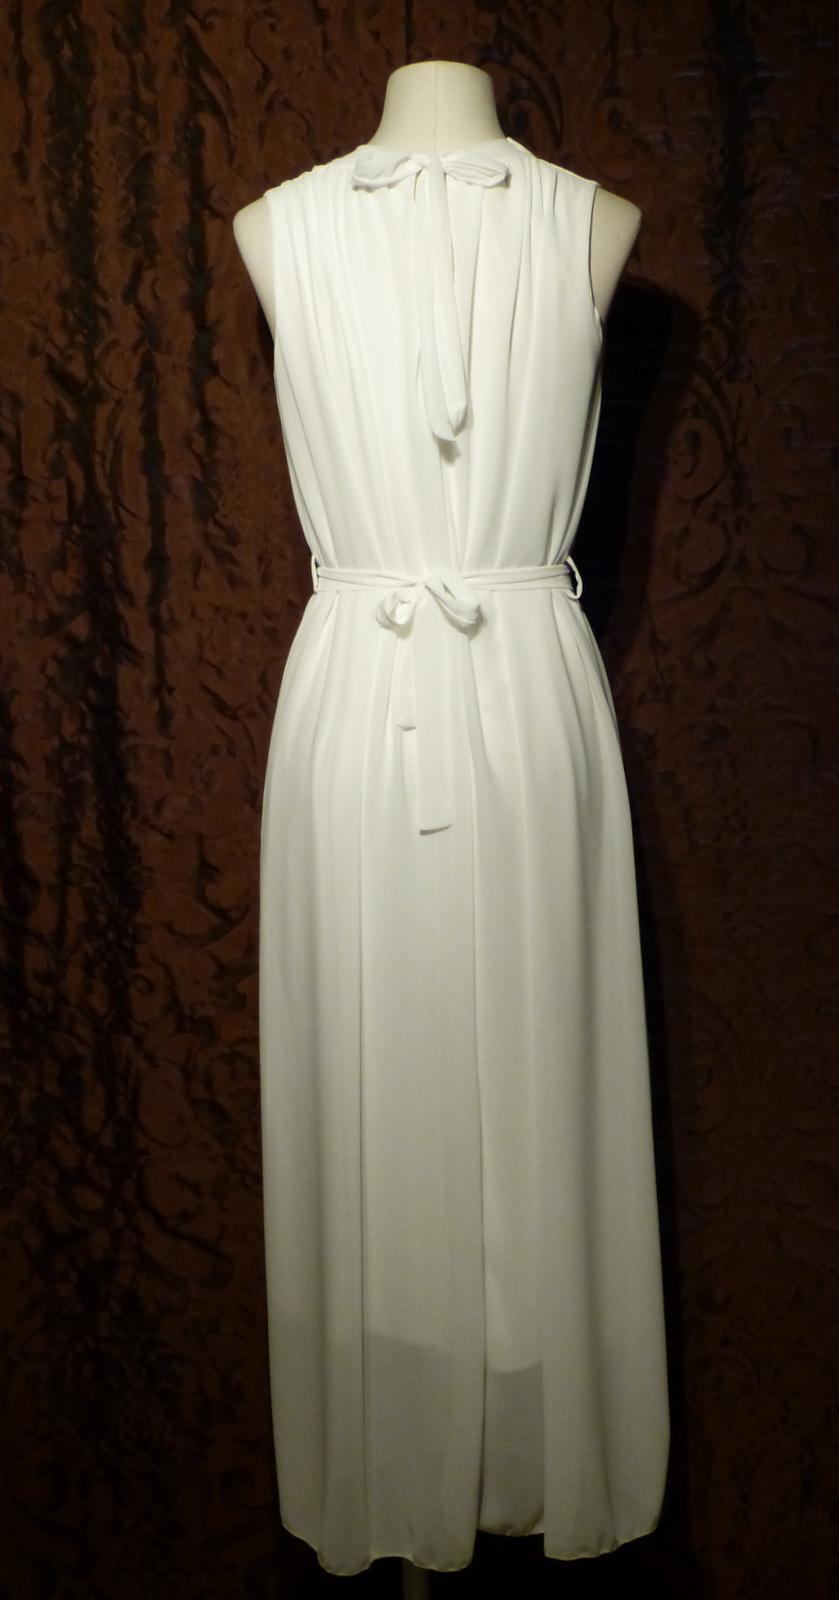 Location robe de mari e location location de robe for Location de robe de mariage en ligne